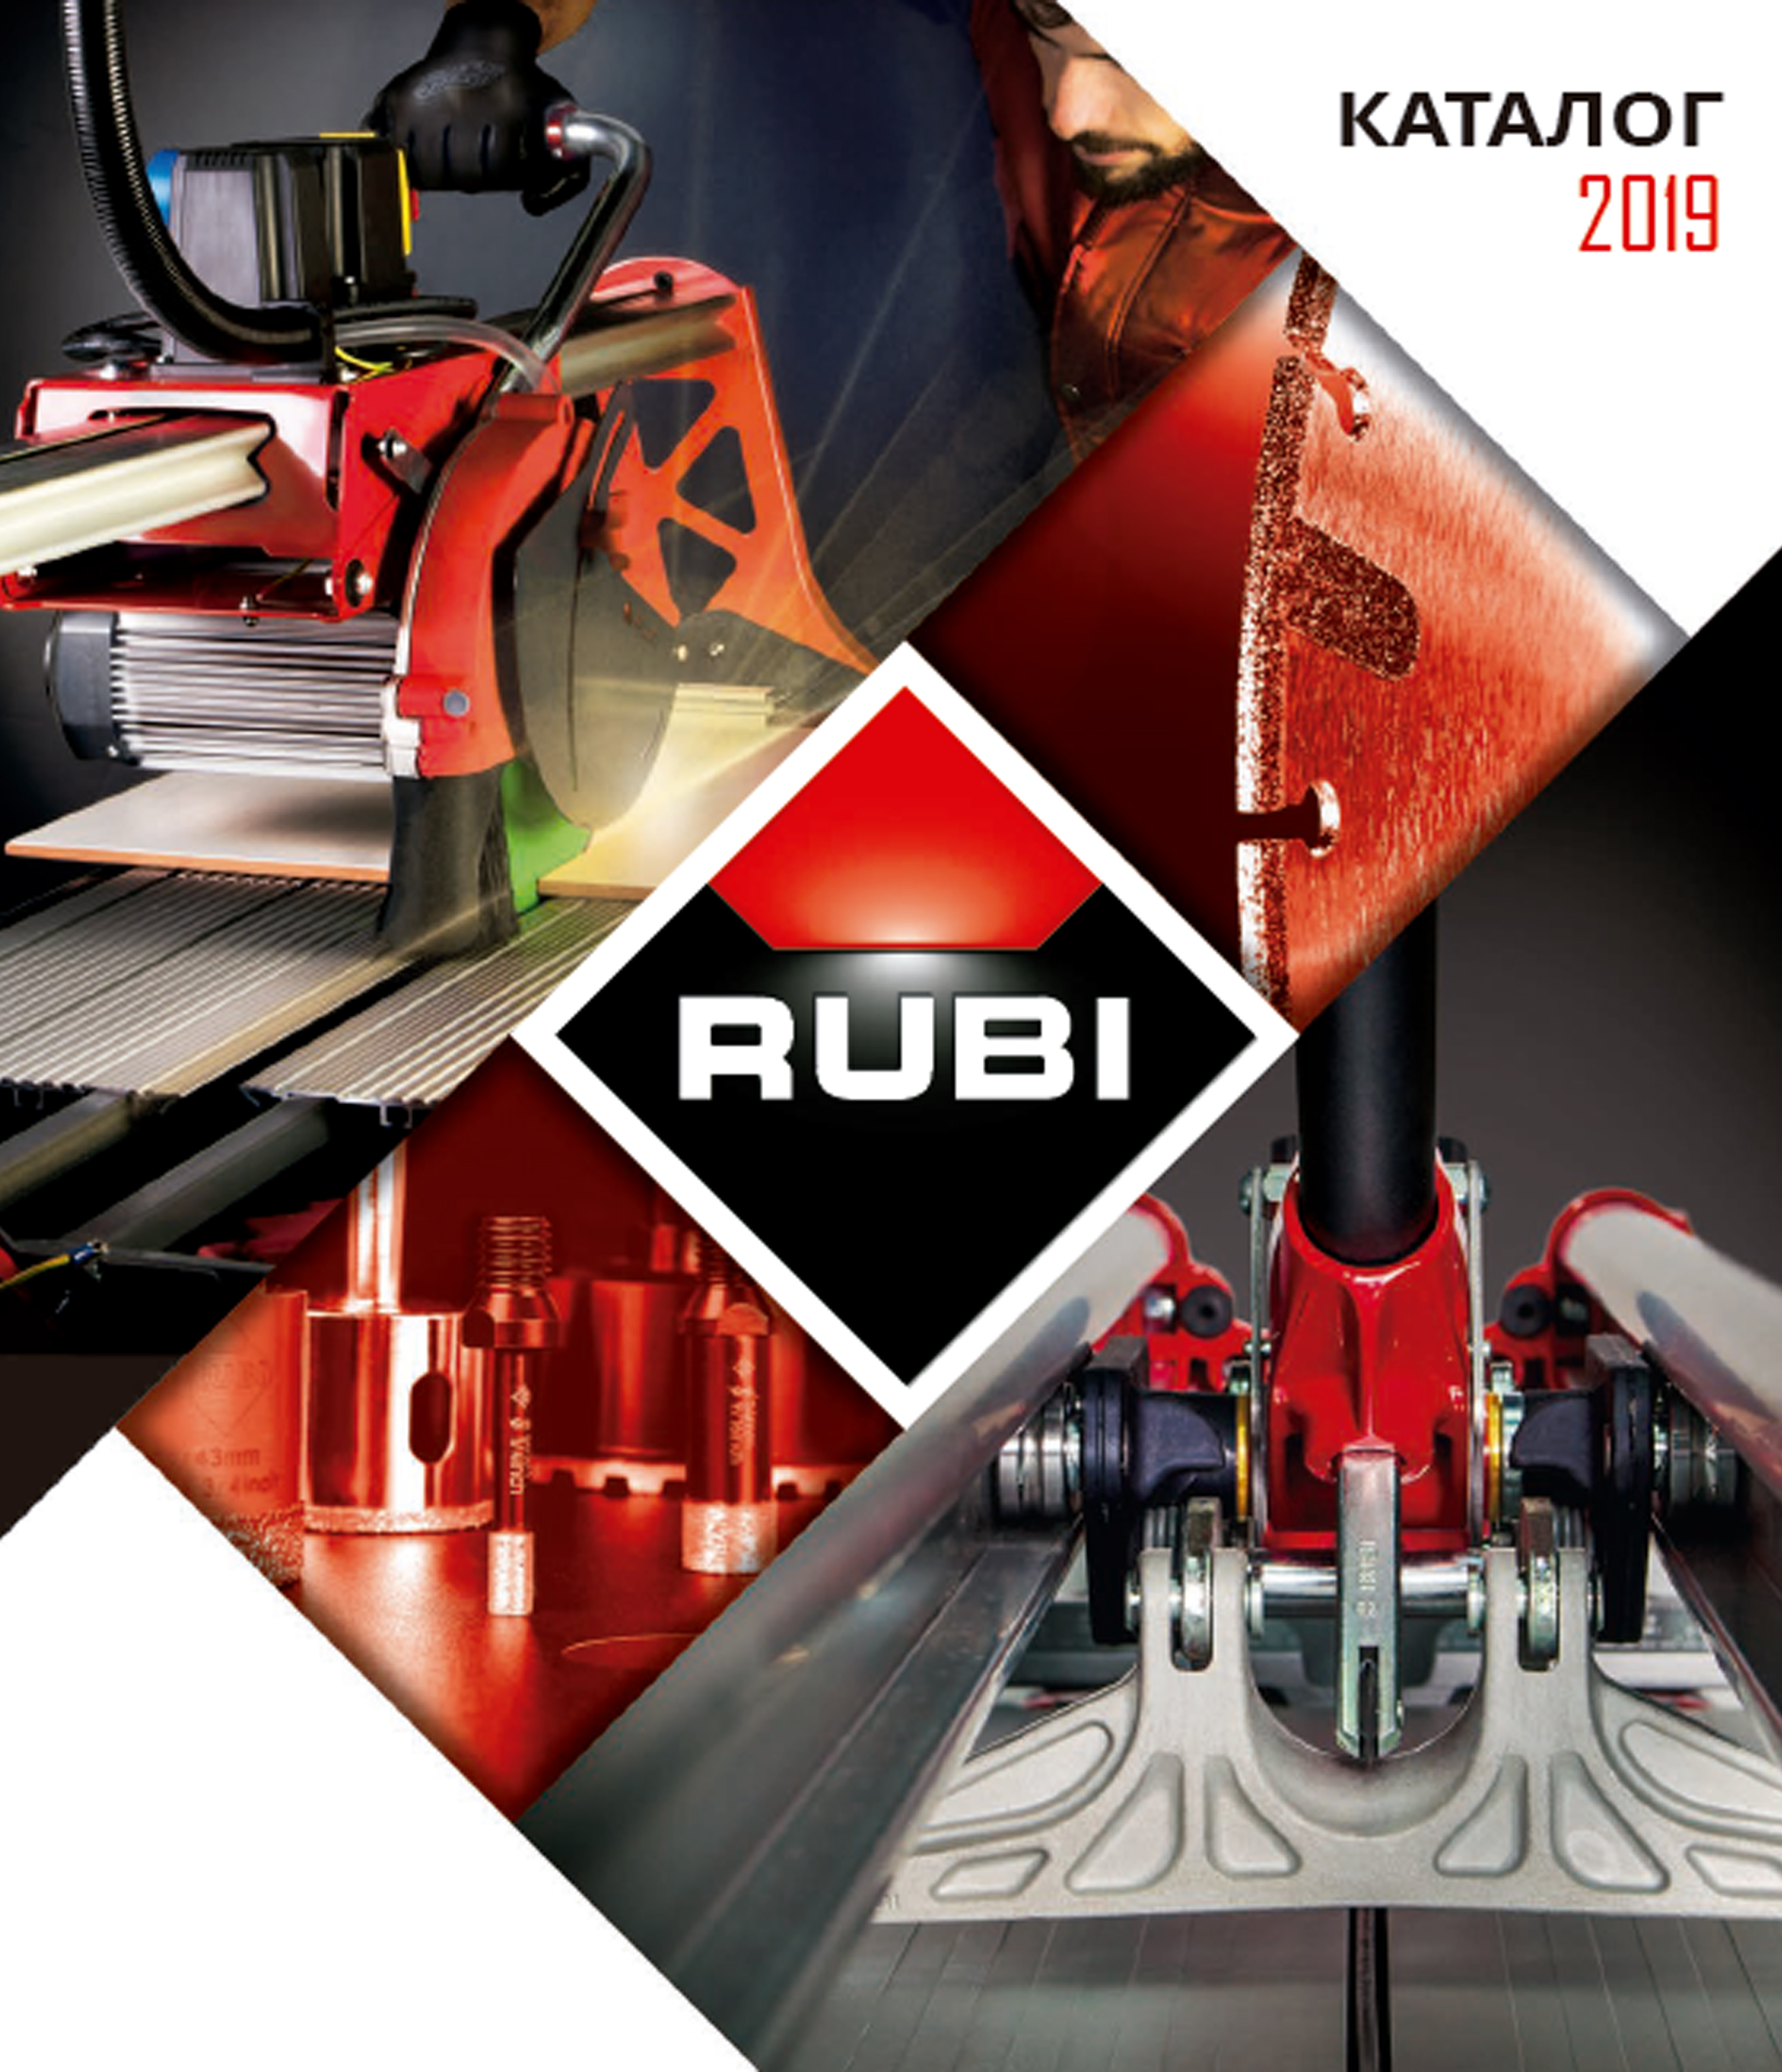 Каталог оборудования RUBI 2019